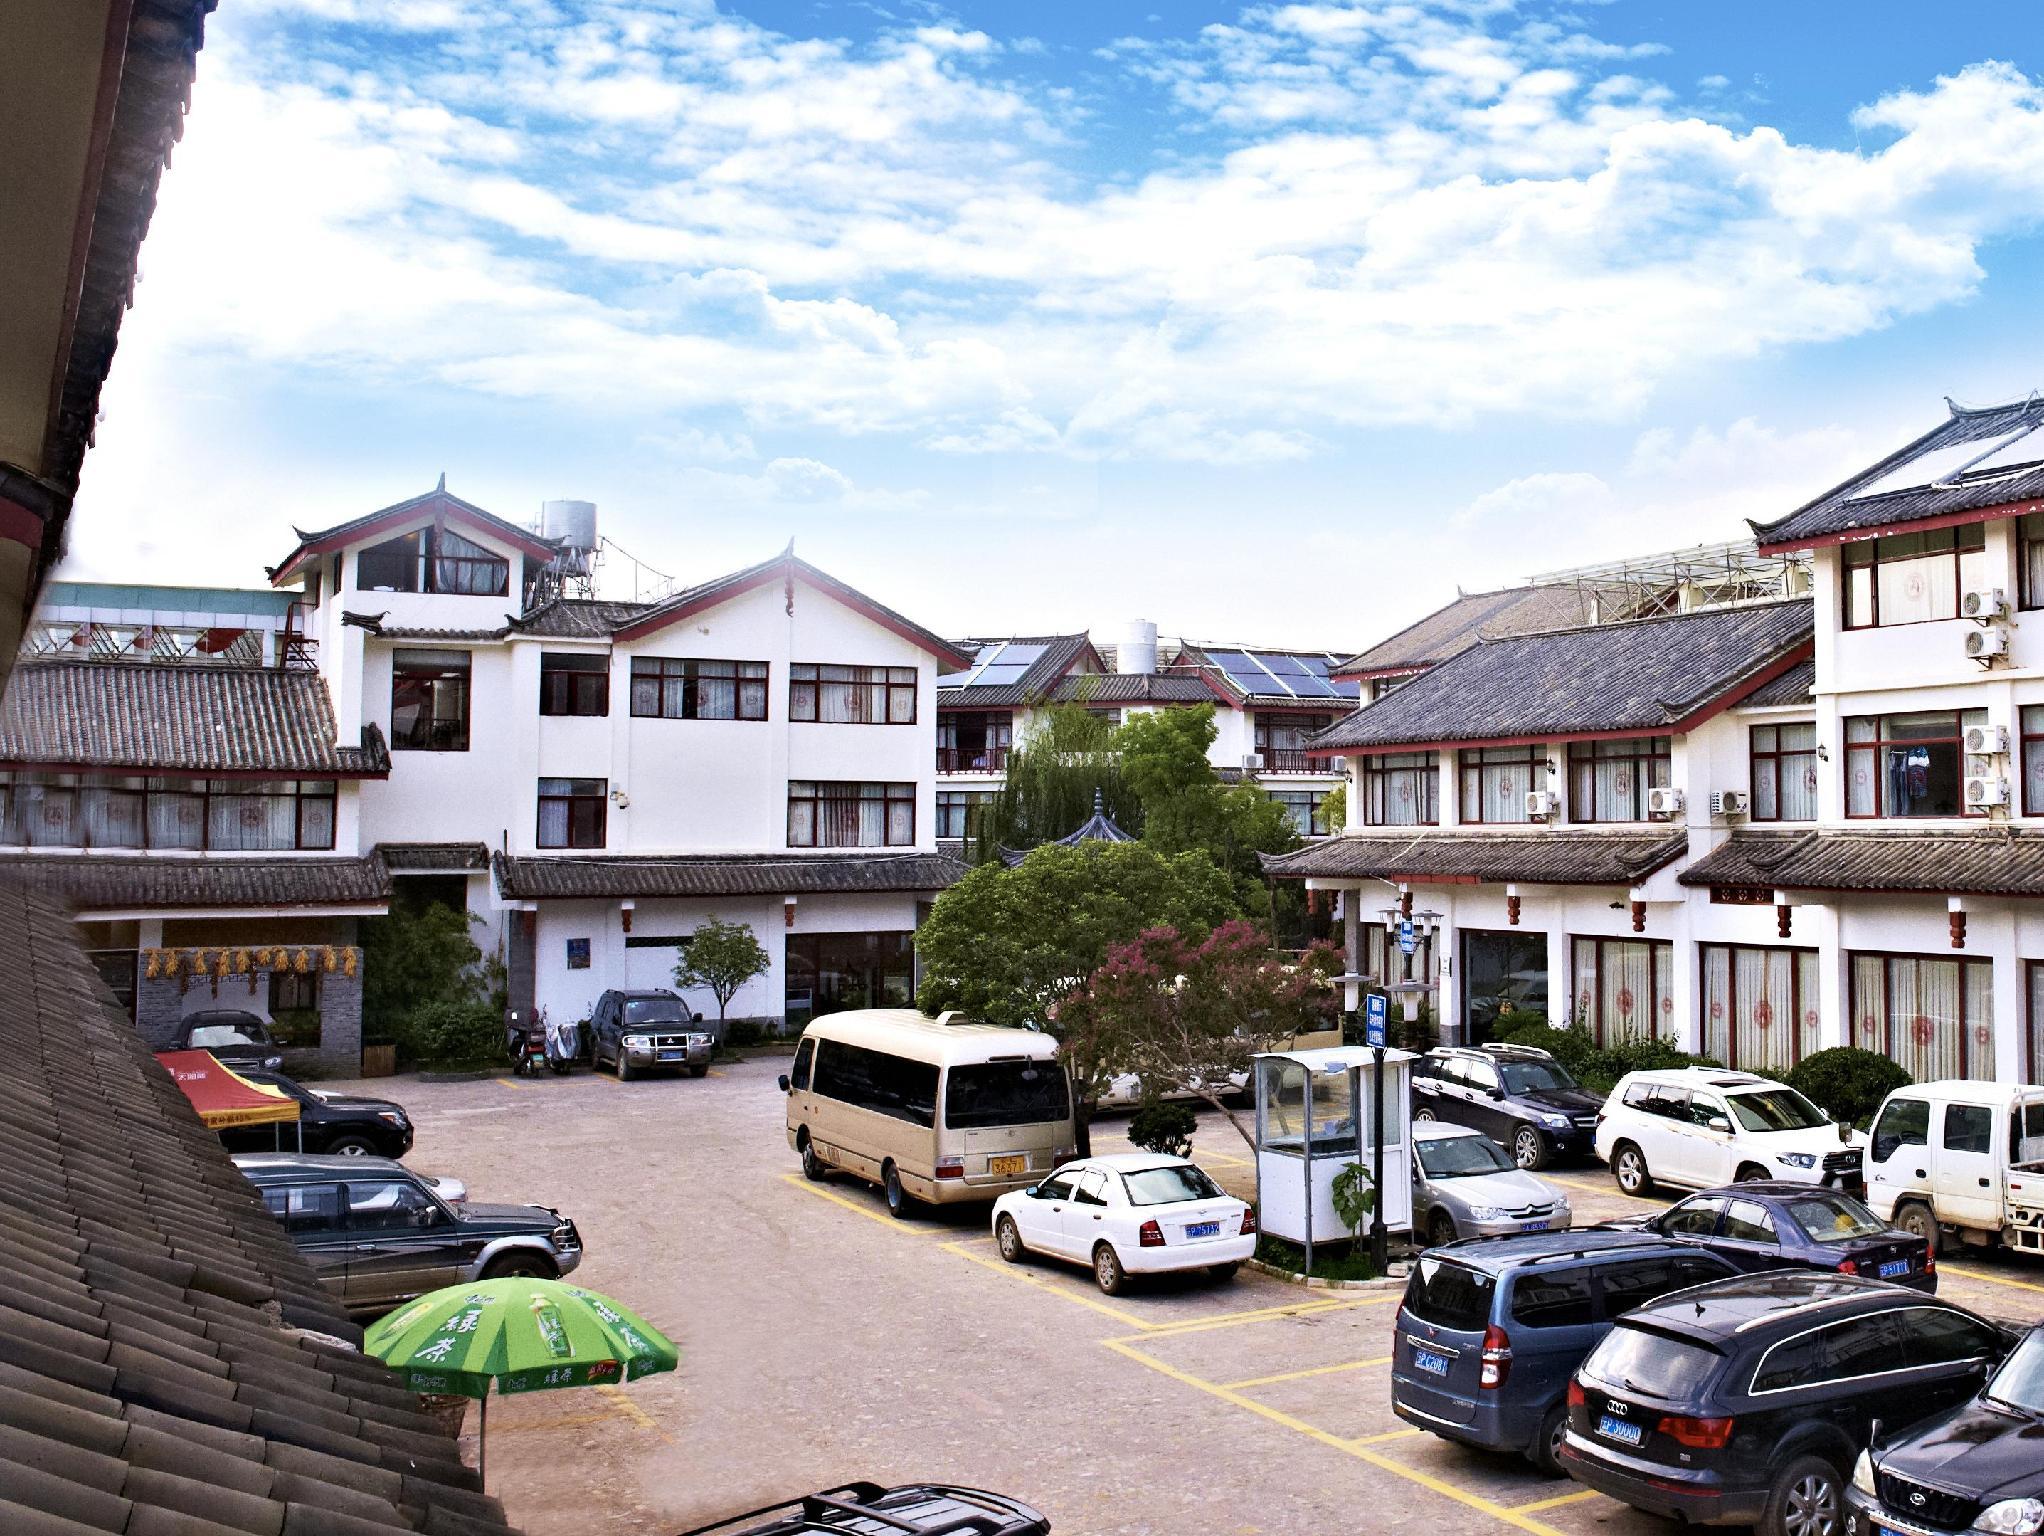 麗江麗江花馬酒店 (Lijiang Huama Hotel)線上訂房|Agoda.com